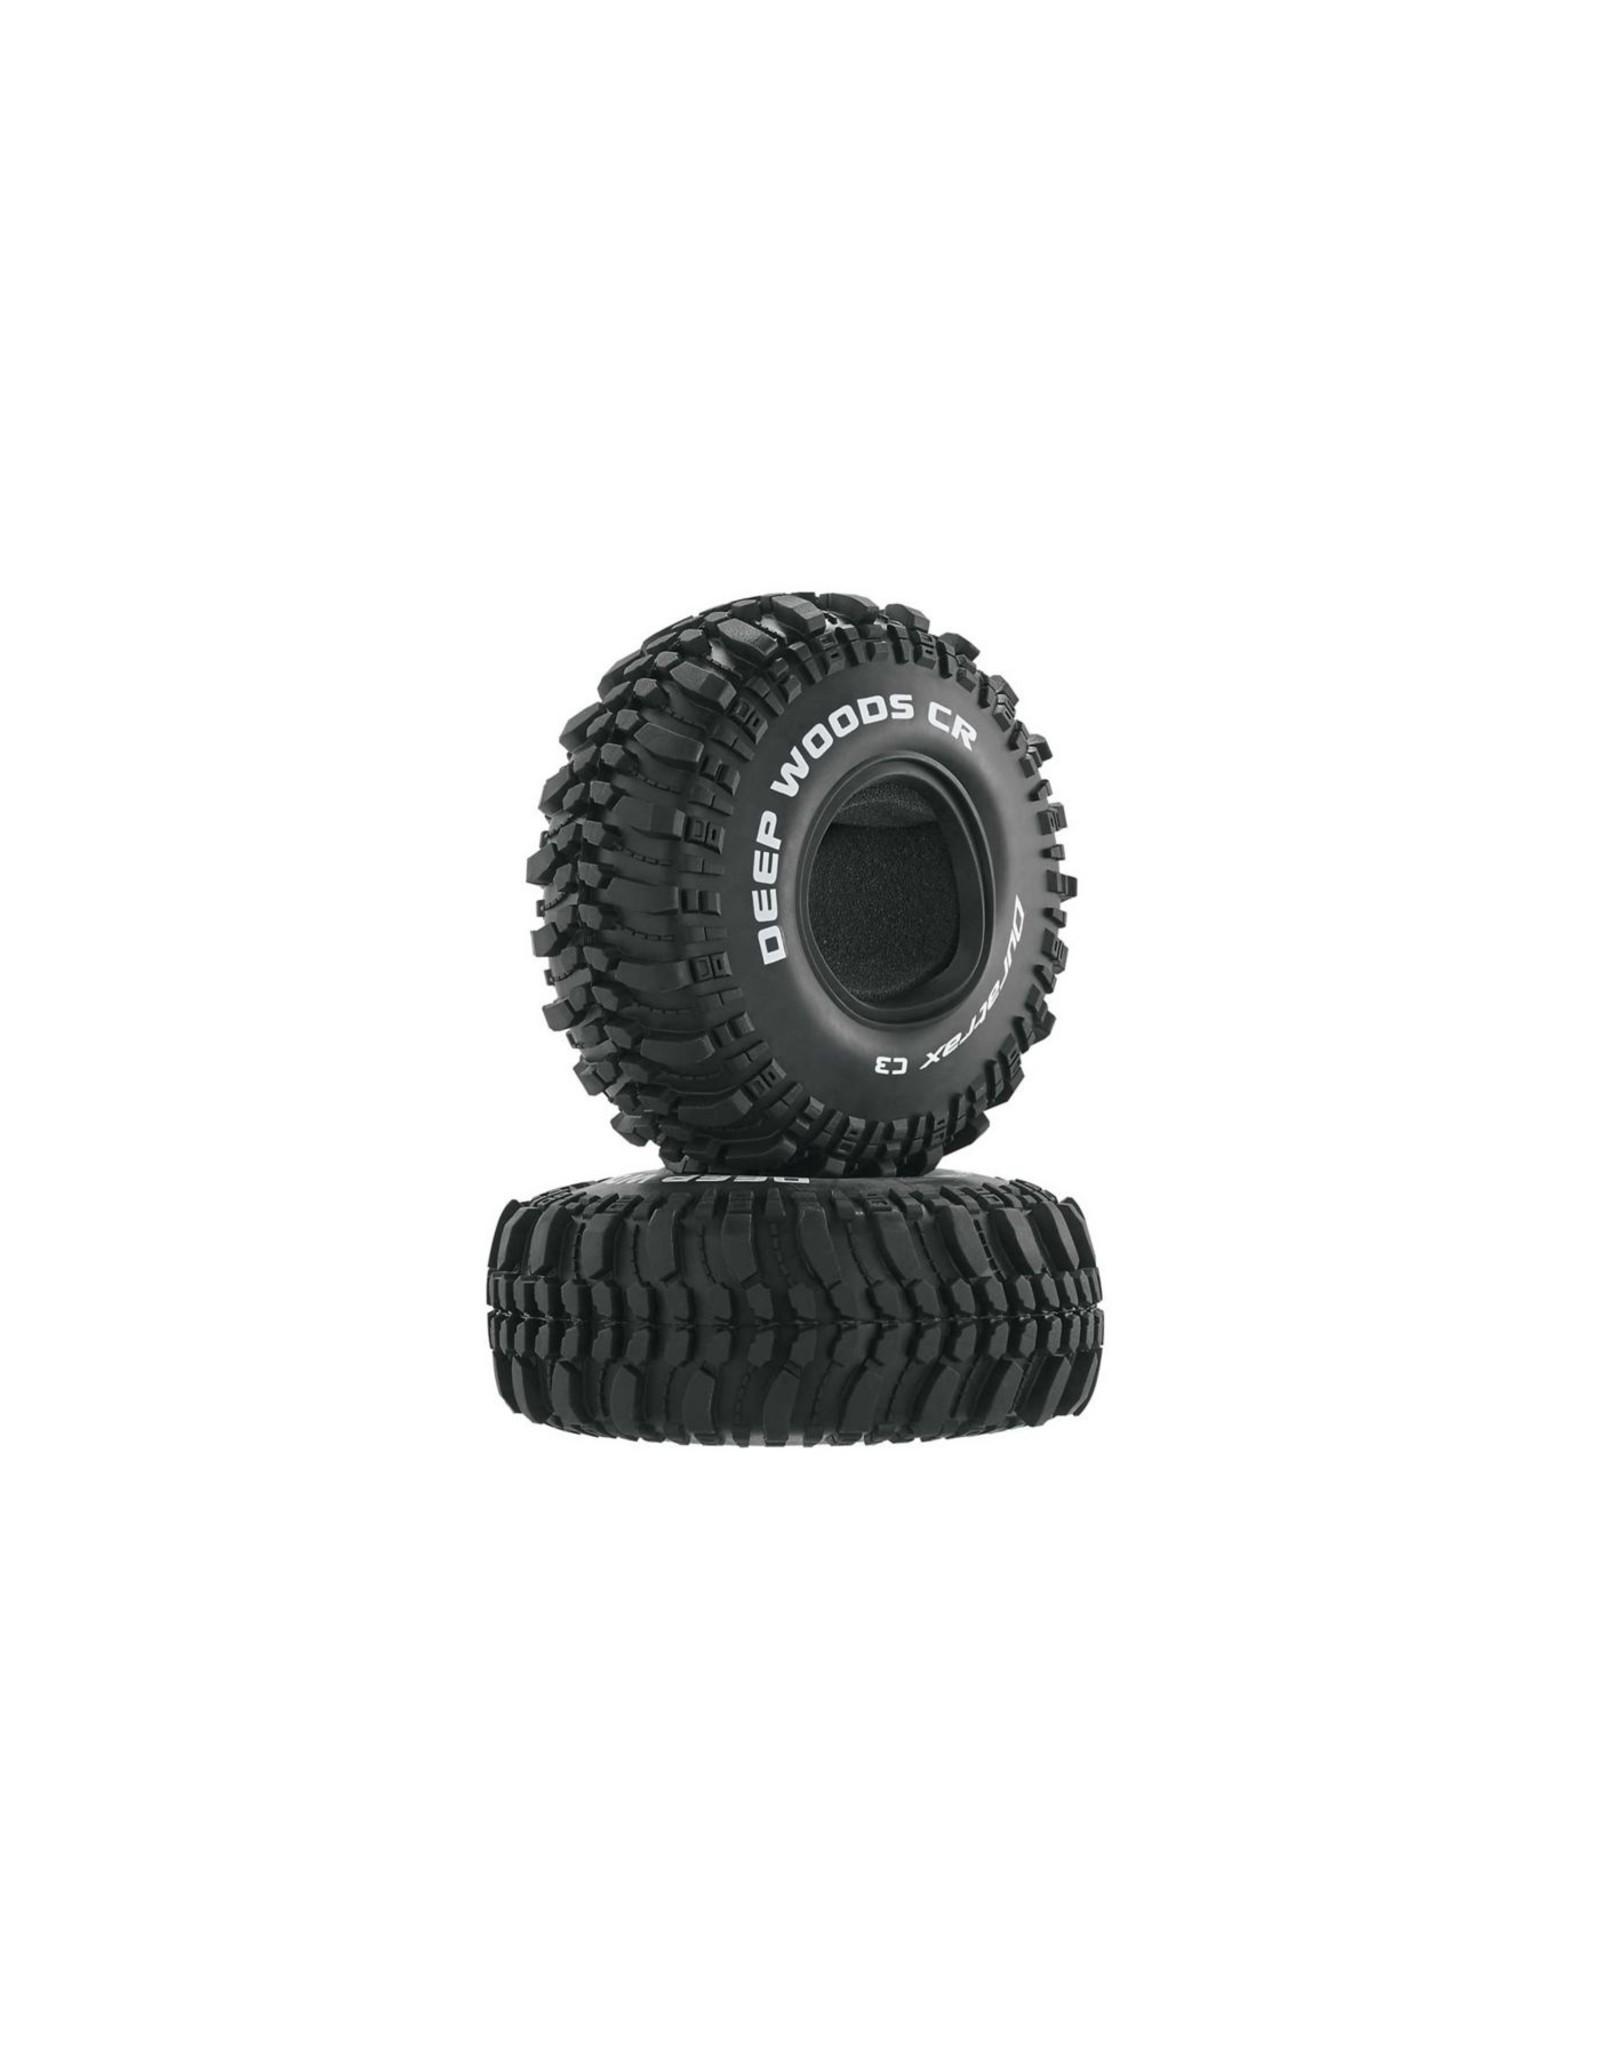 "Duratrax Deep Woods CR 1.9"" Crawler Tire C3 (2)  (DTXC4017)"